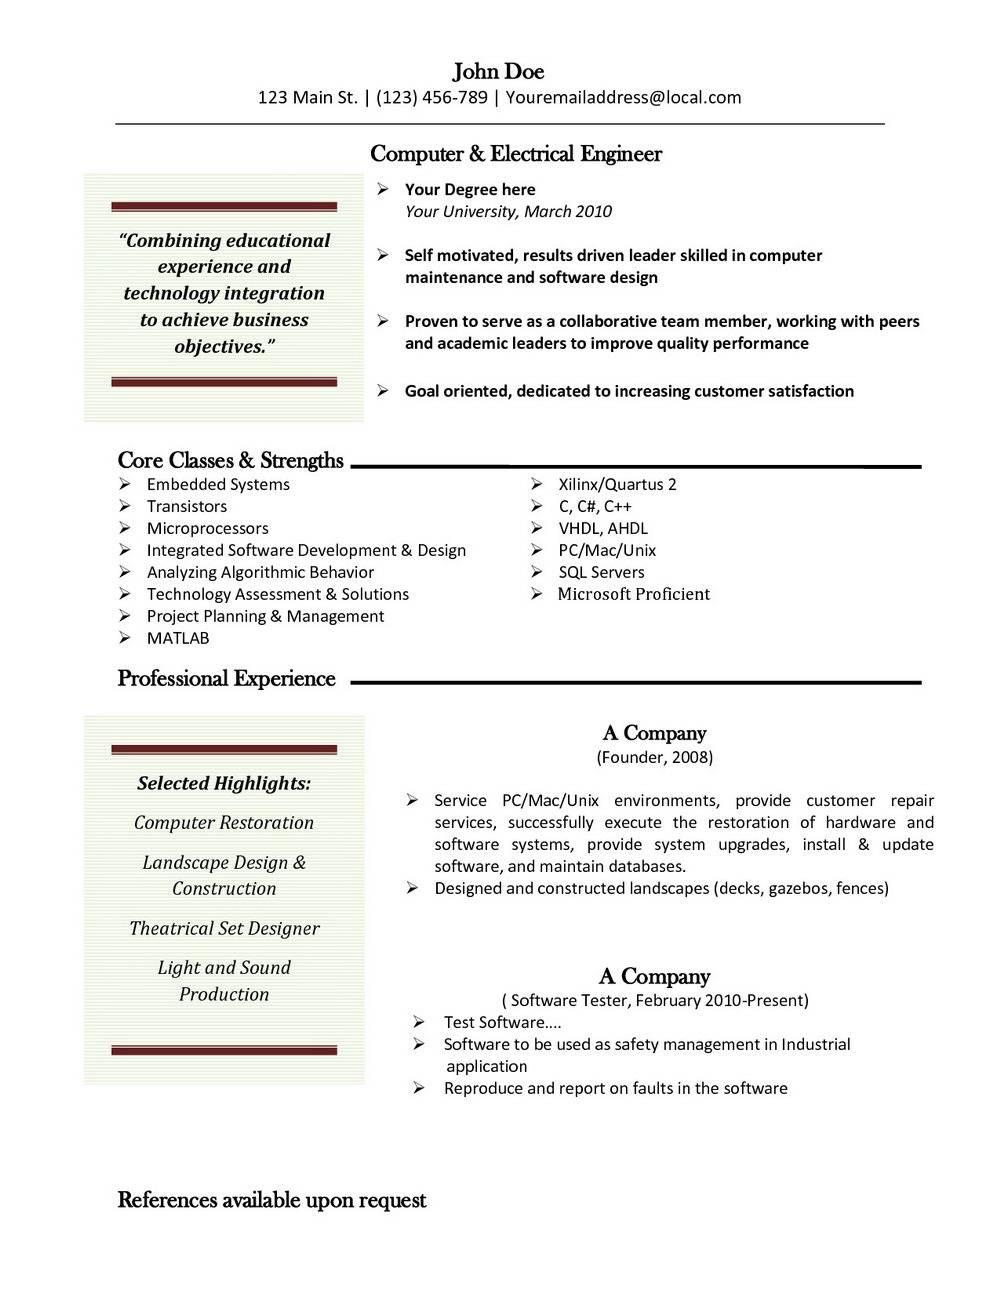 Resume Templates Free Mac Word